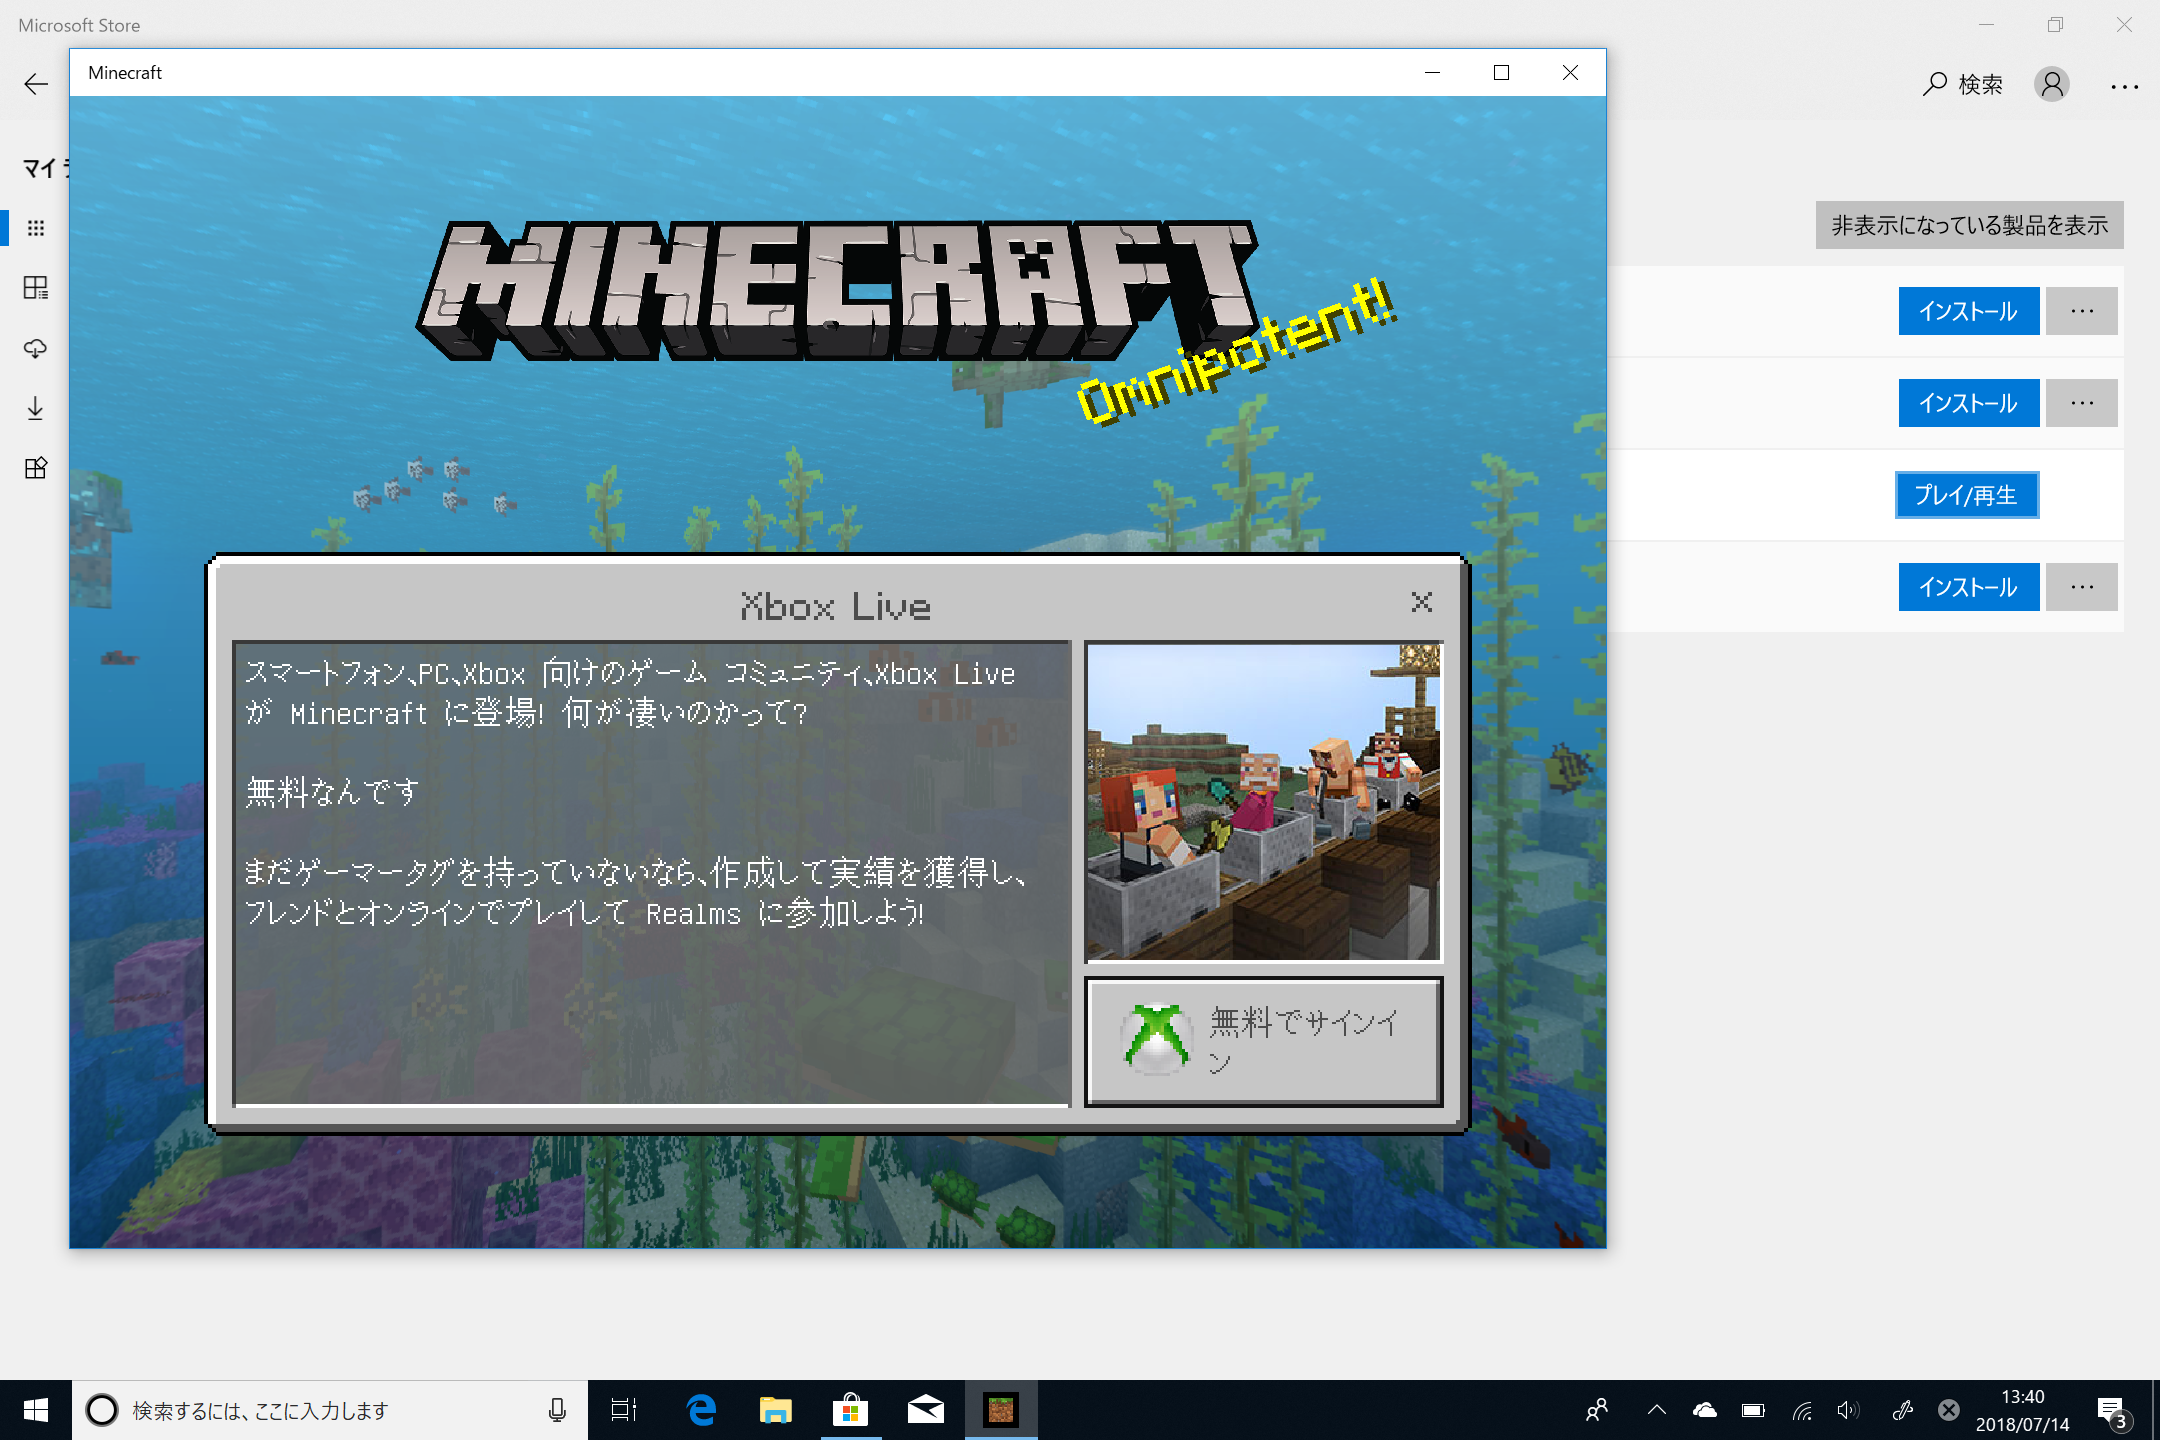 Windows 10版マインクラフトが起動する。